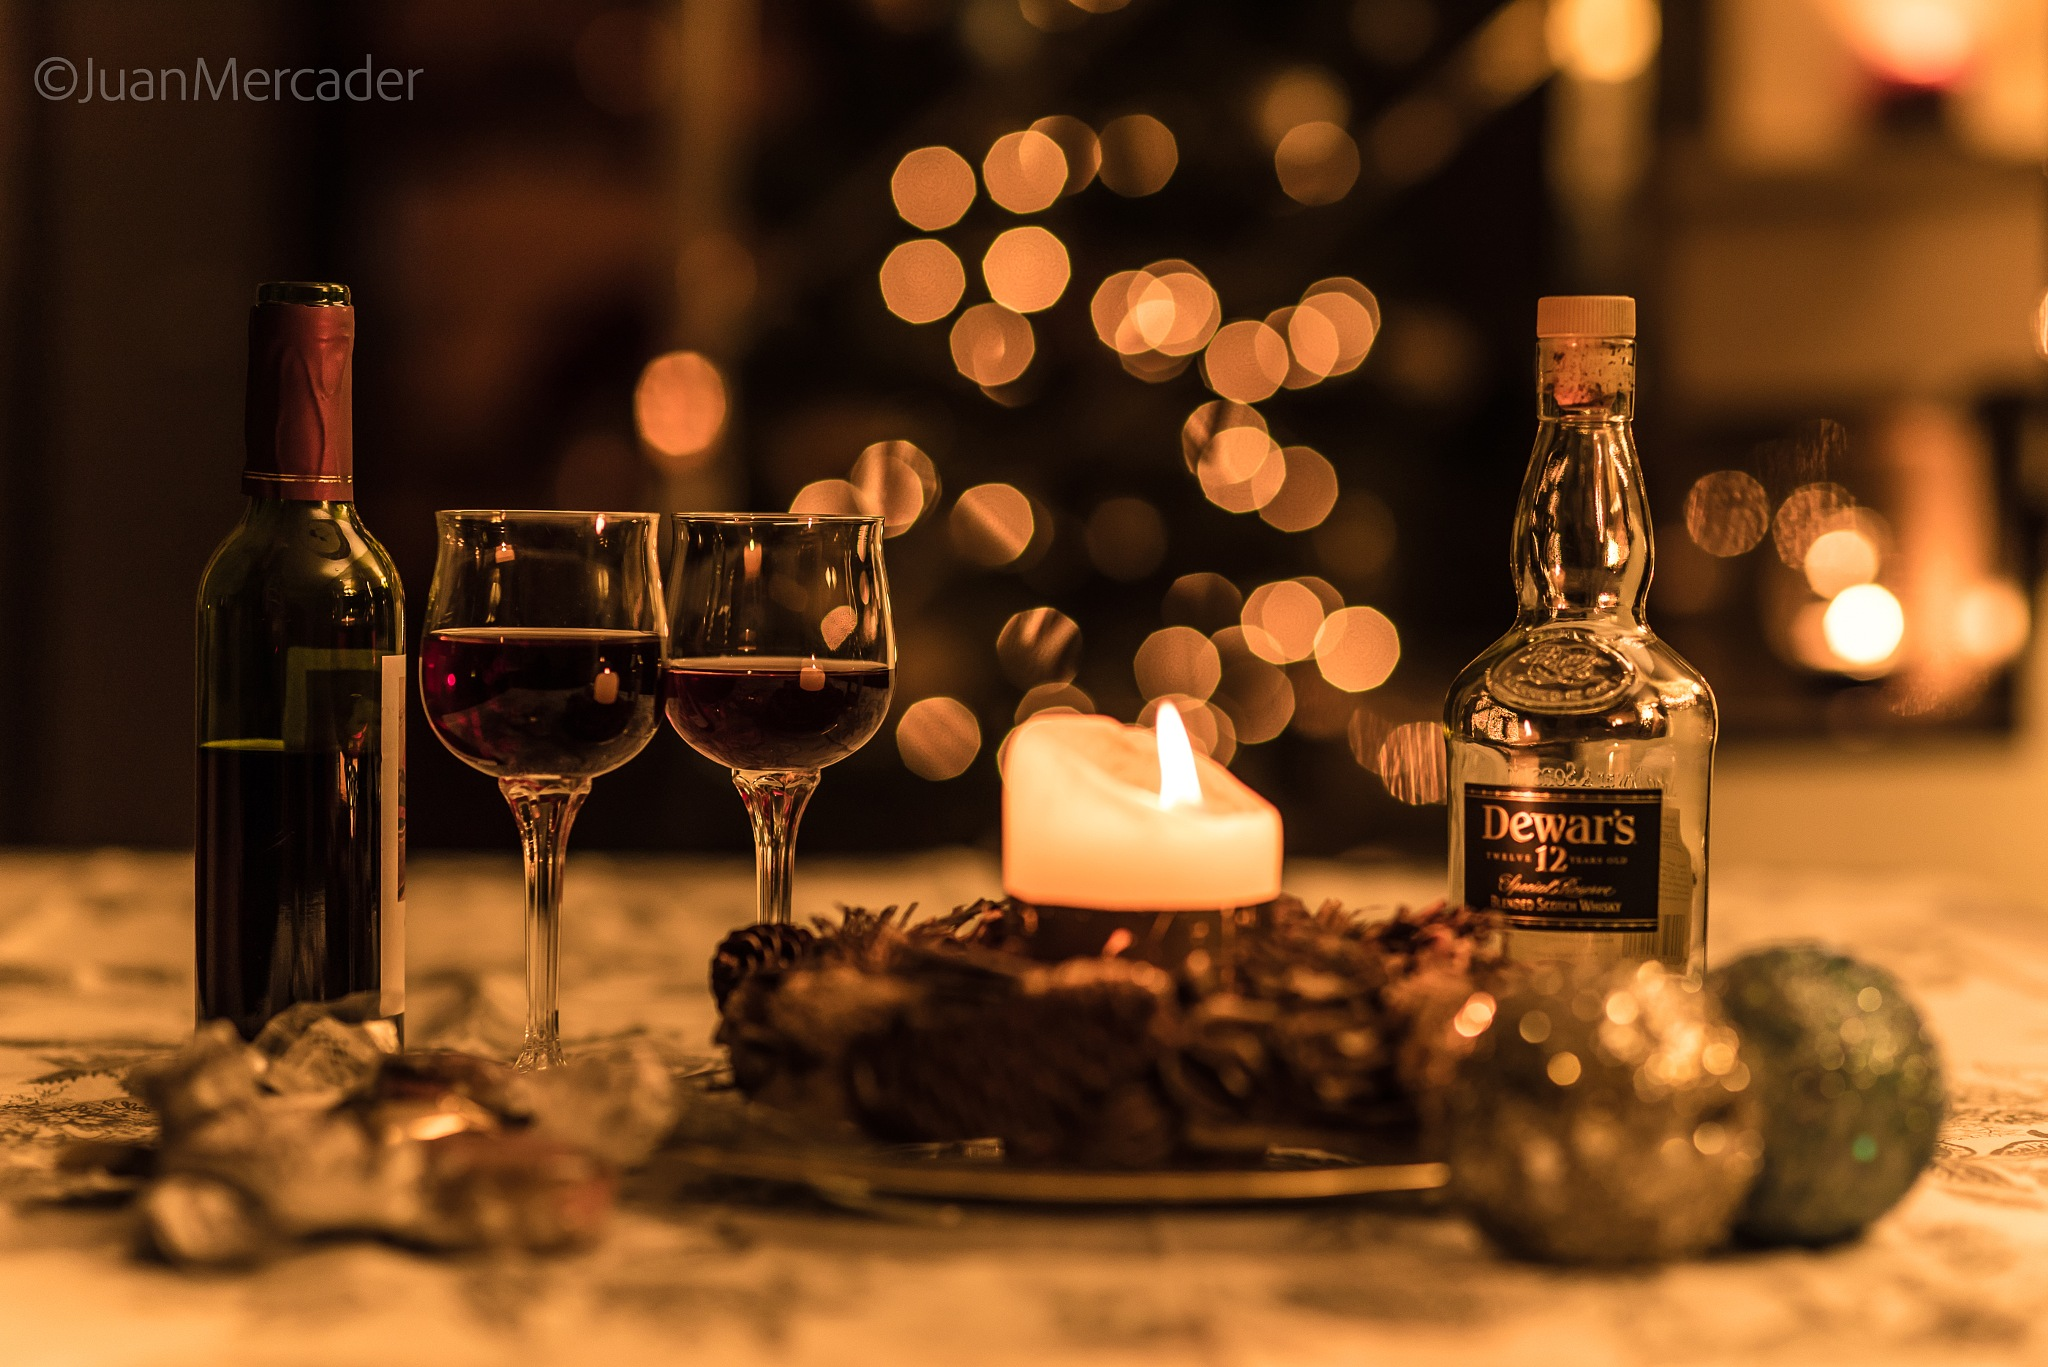 Feliz Navidad by JuanMercader